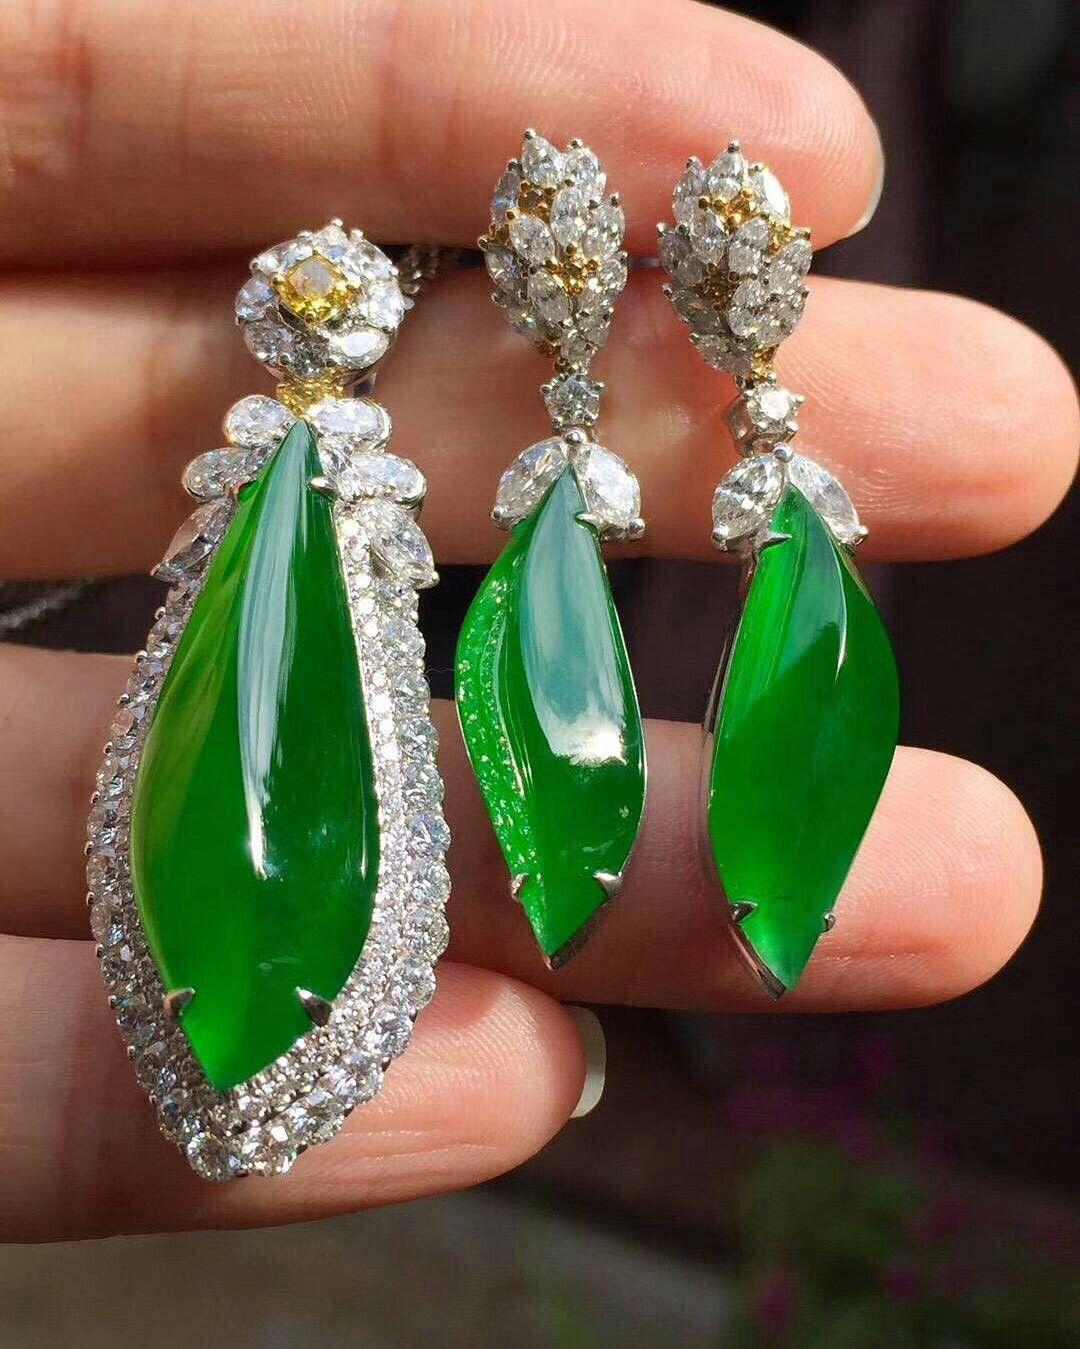 margueritecaicai.  jade  jadeite  gem  jewelry  jewellry  b87a3ed834c85